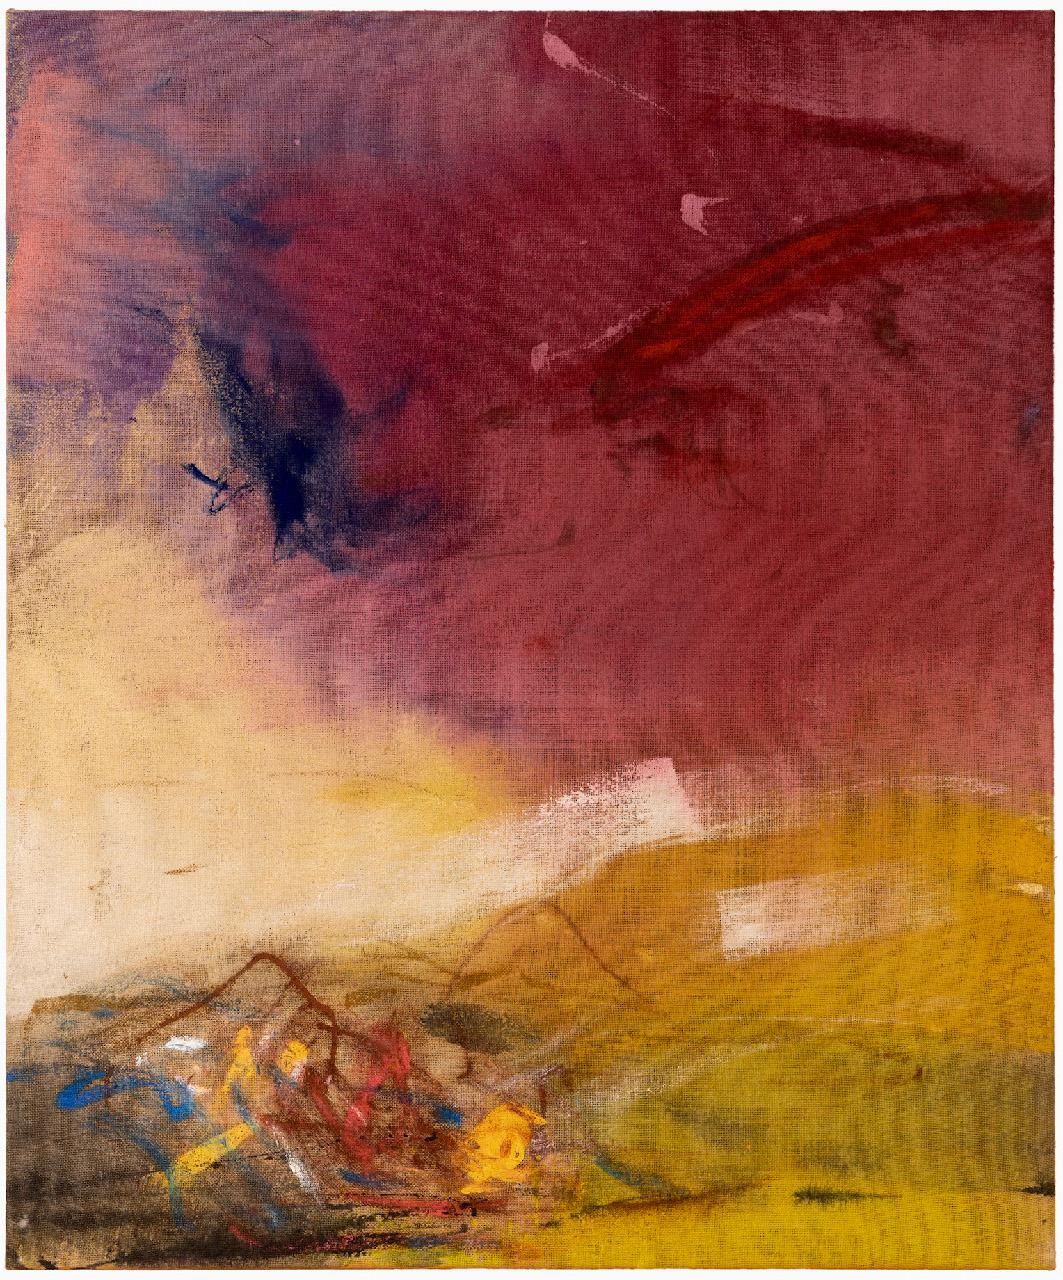 01_Leiko Ikemura_CRN Act, 2020, tempera on jute, 120x100 cm